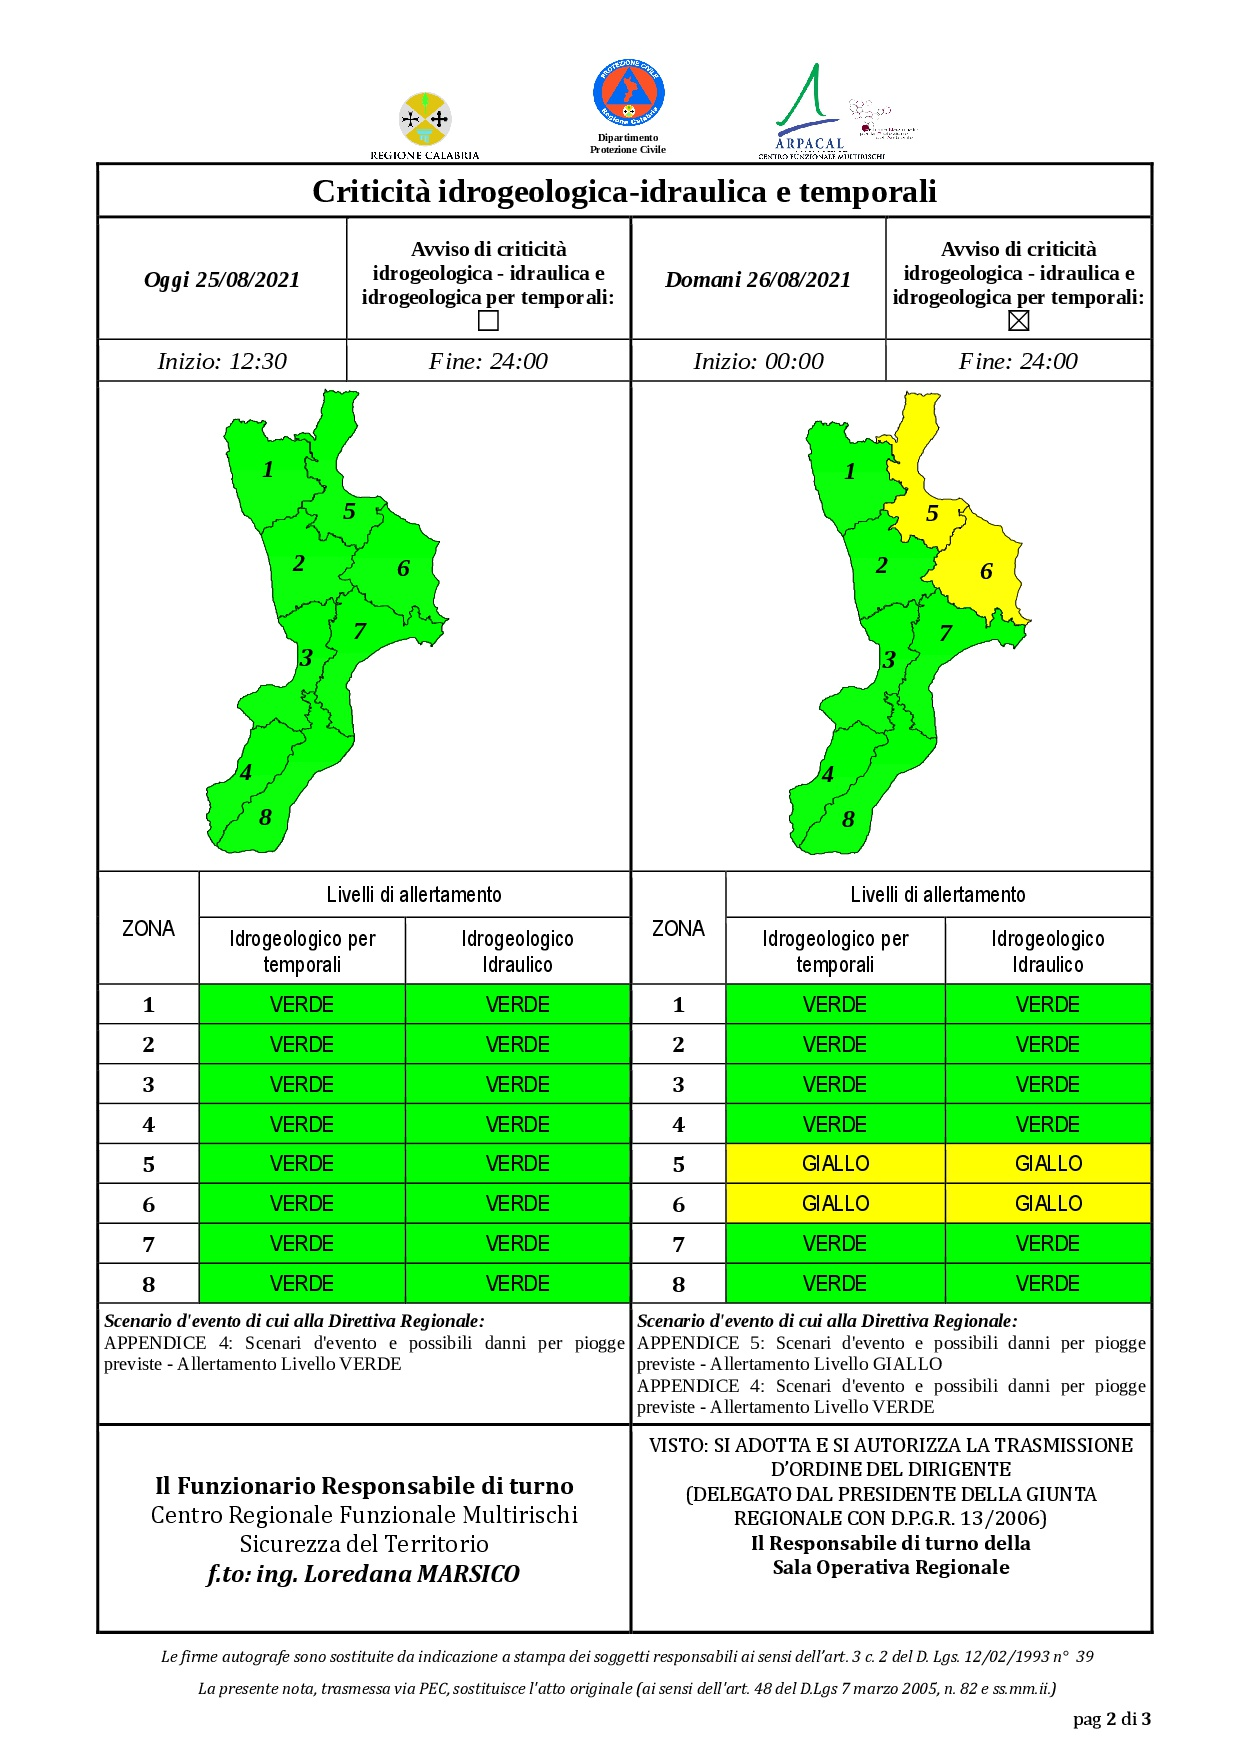 Criticità idrogeologica-idraulica e temporali in Calabria 25-08-2021